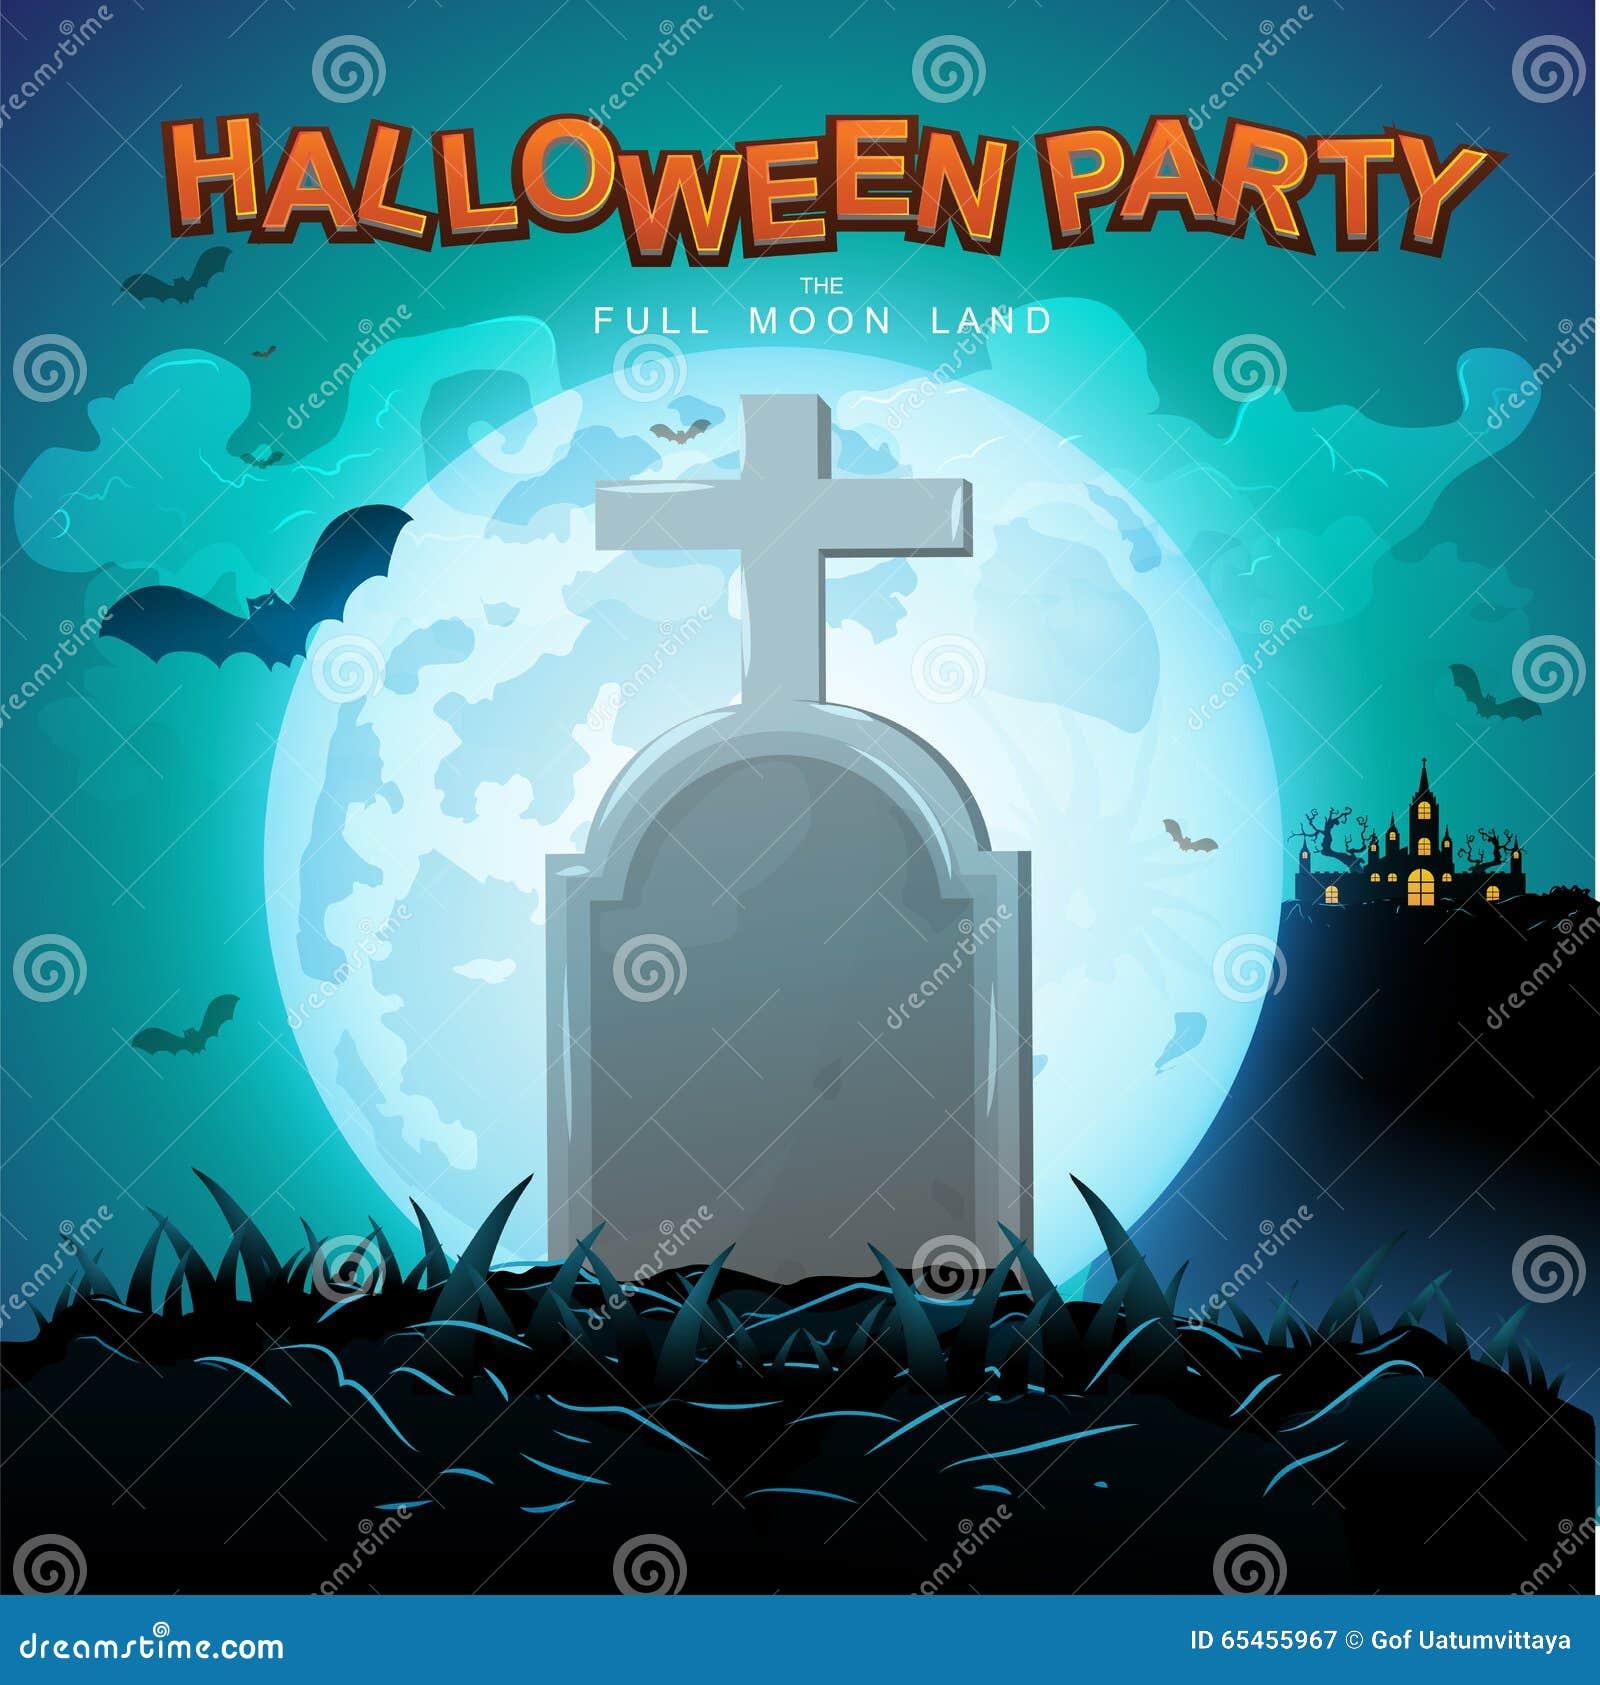 Halloween Party Vector Concept Full Moon Land Stock Illustration ...